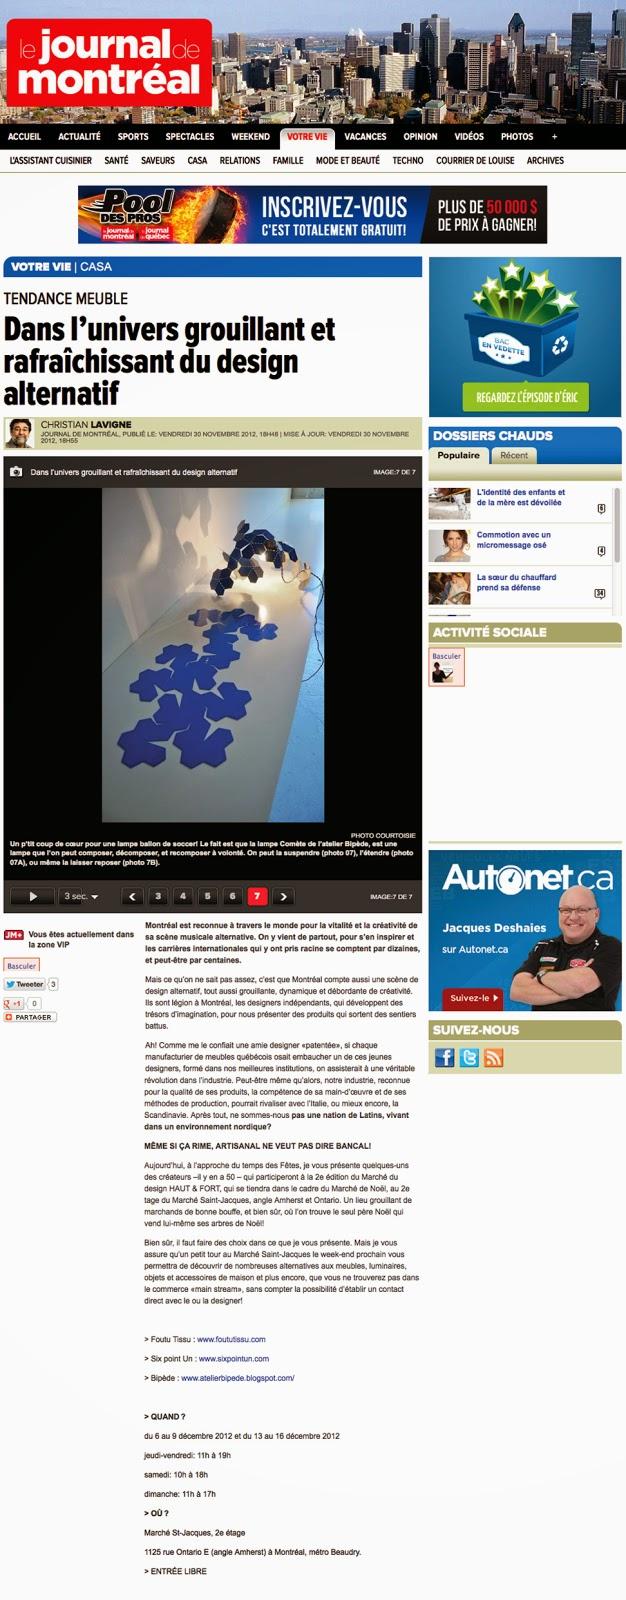 http://www.journaldemontreal.com/2012/11/30/dans-lunivers-grouillant-et-rafraichissant-du-design-alternatif